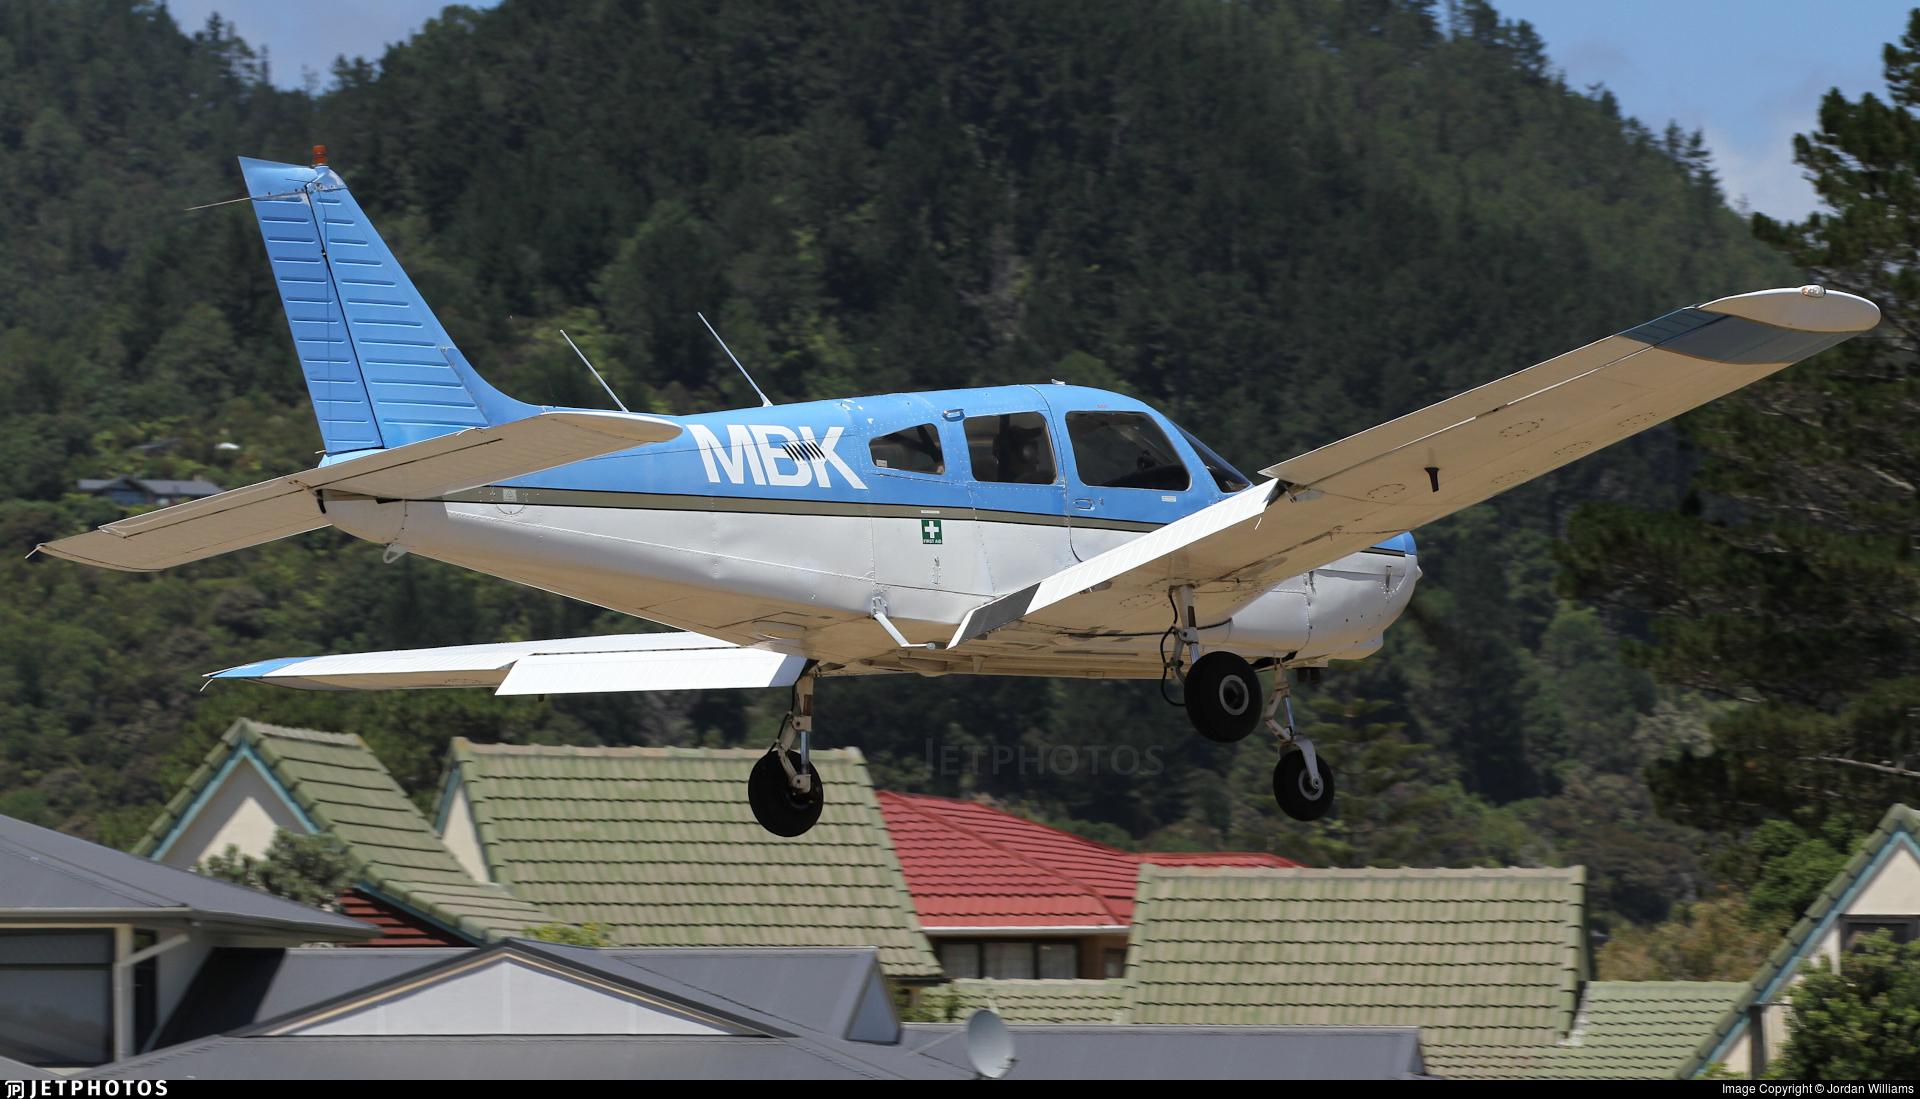 ZK-MBK - Piper PA-28-161 Warrior II - Private